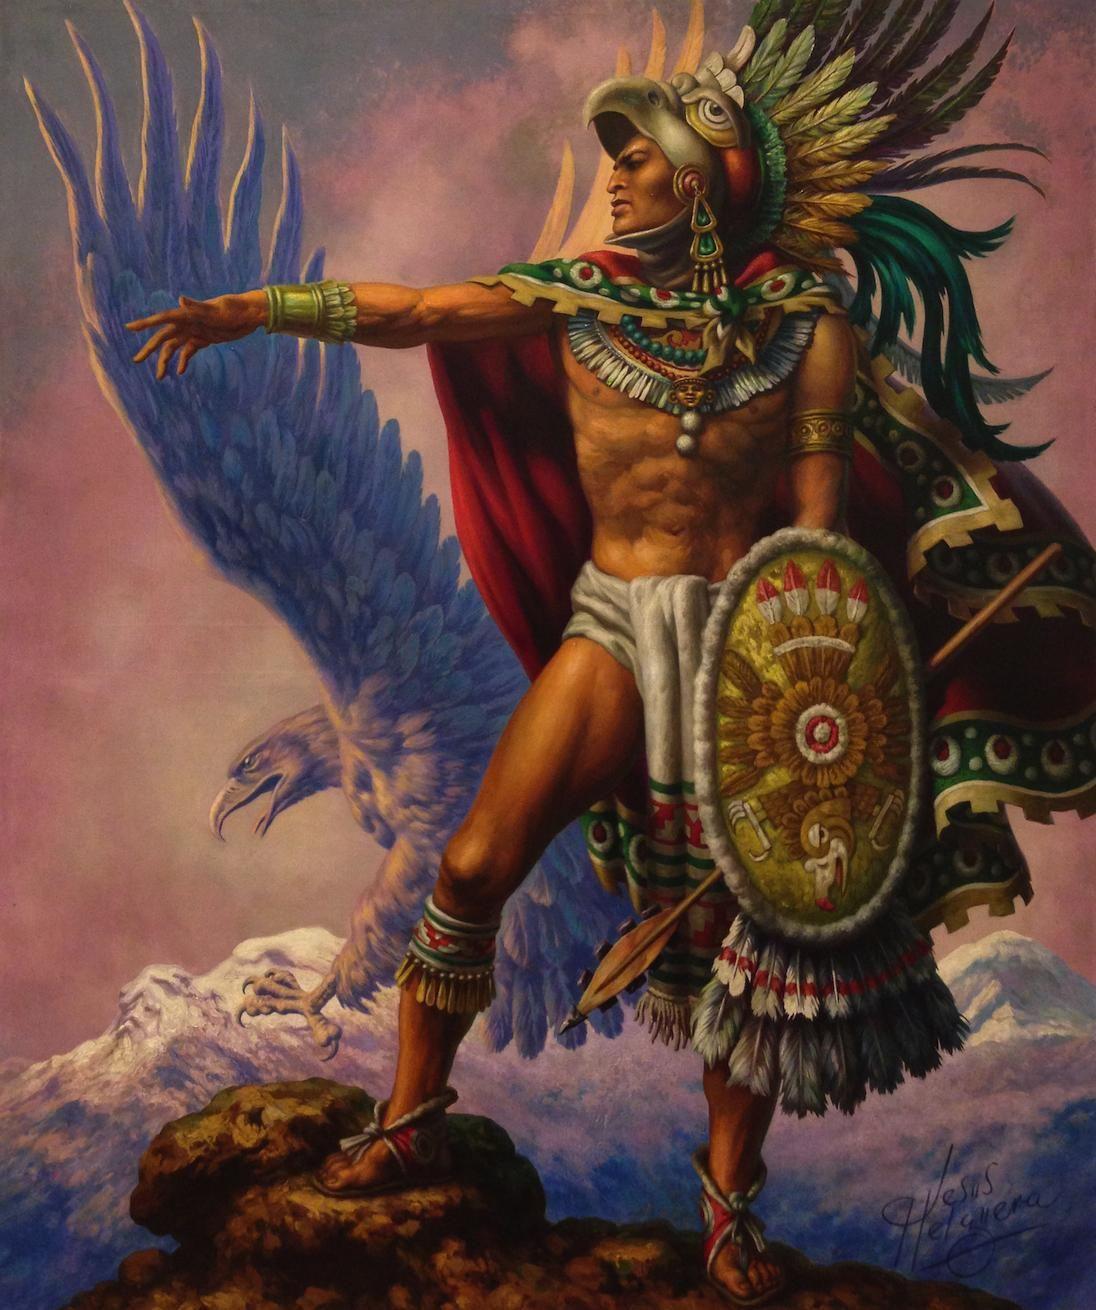 Pinturas Mexicanas Aztec Art Aztec Warrior Mexican Artwork